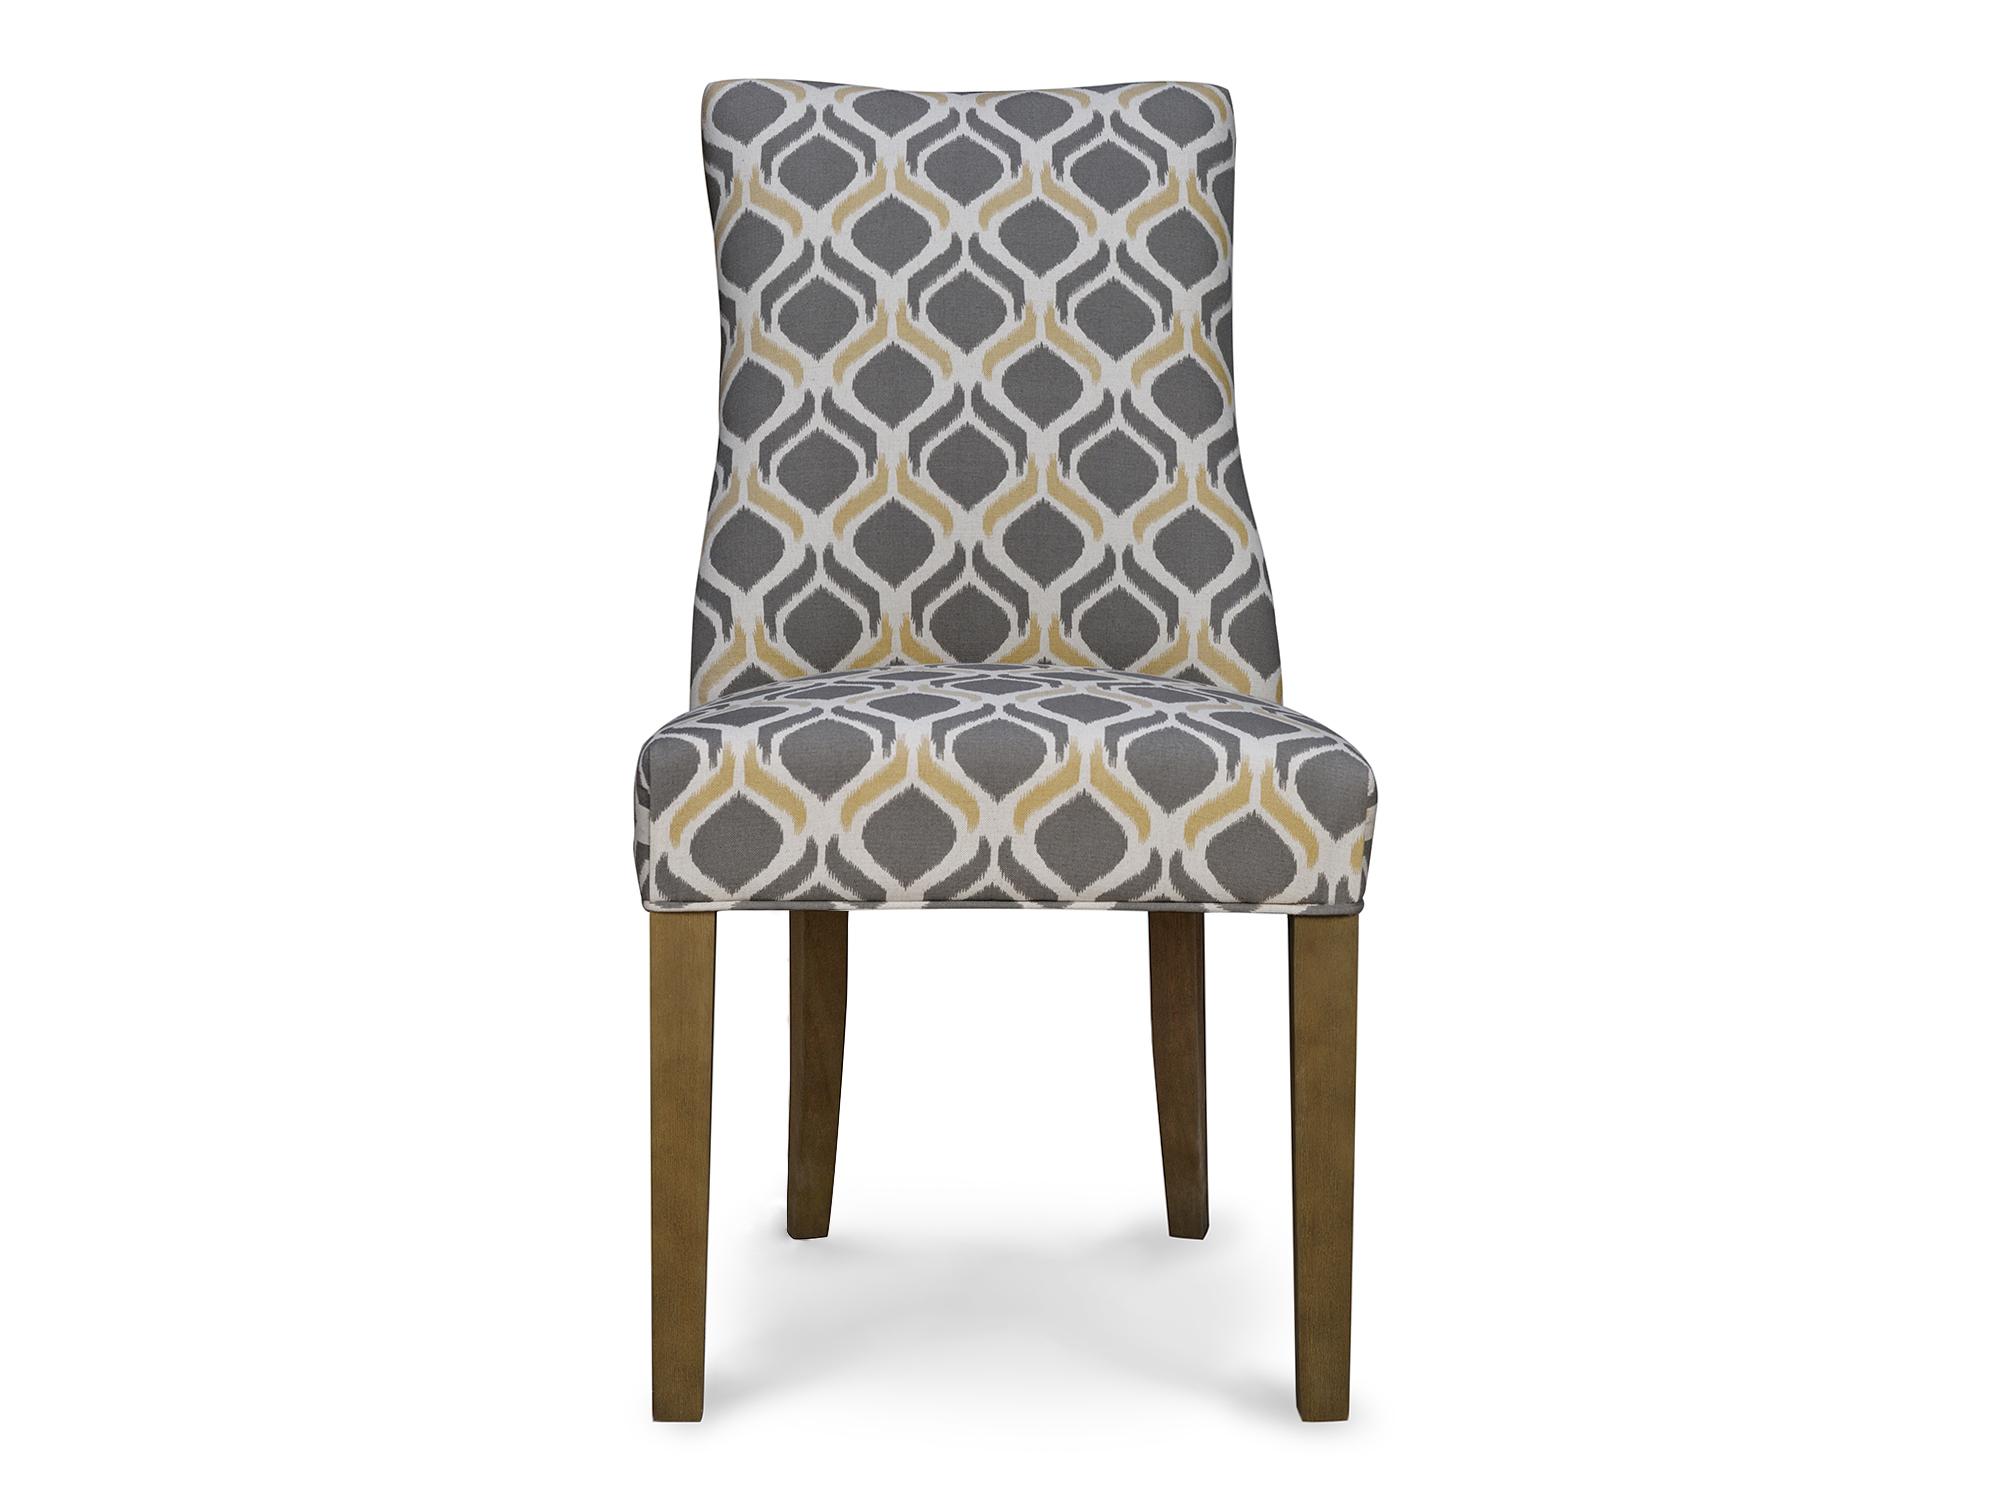 Кухонный стул Gramercy 15444635 от thefurnish